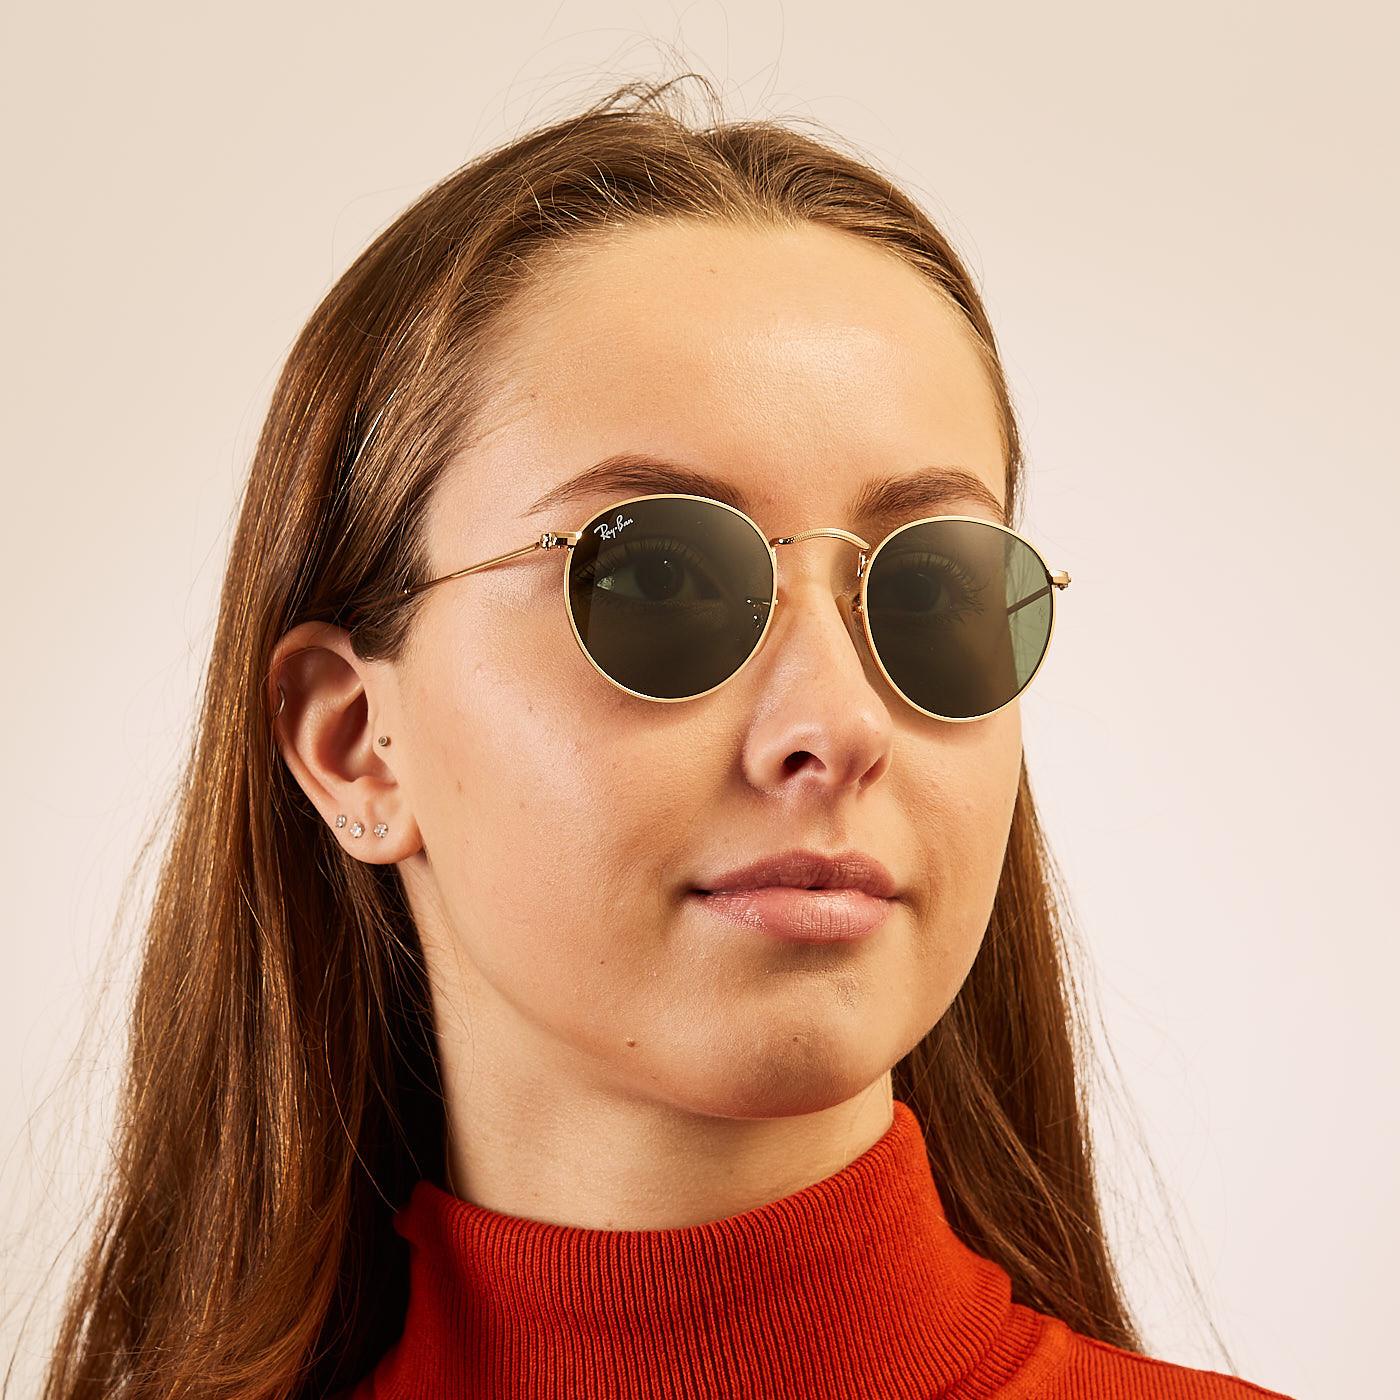 Ray-Ban Round Metal zonnebril RB3447 47 001